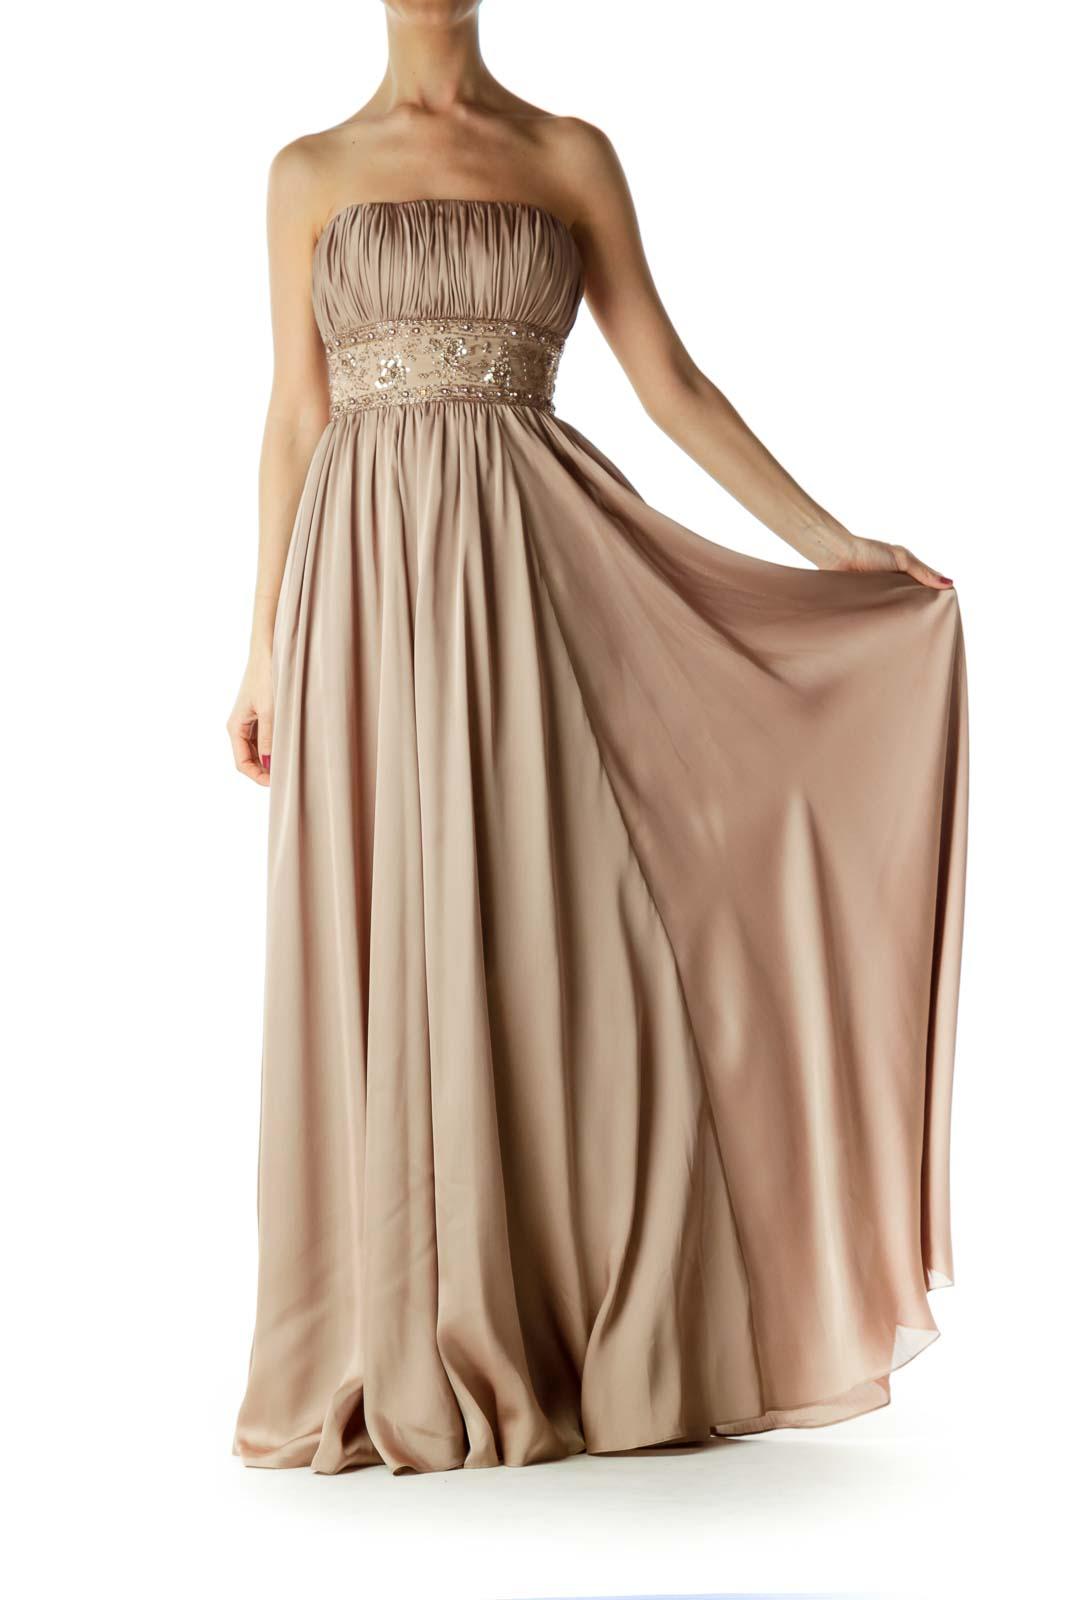 Gold Beaded Strapless Evening Dress